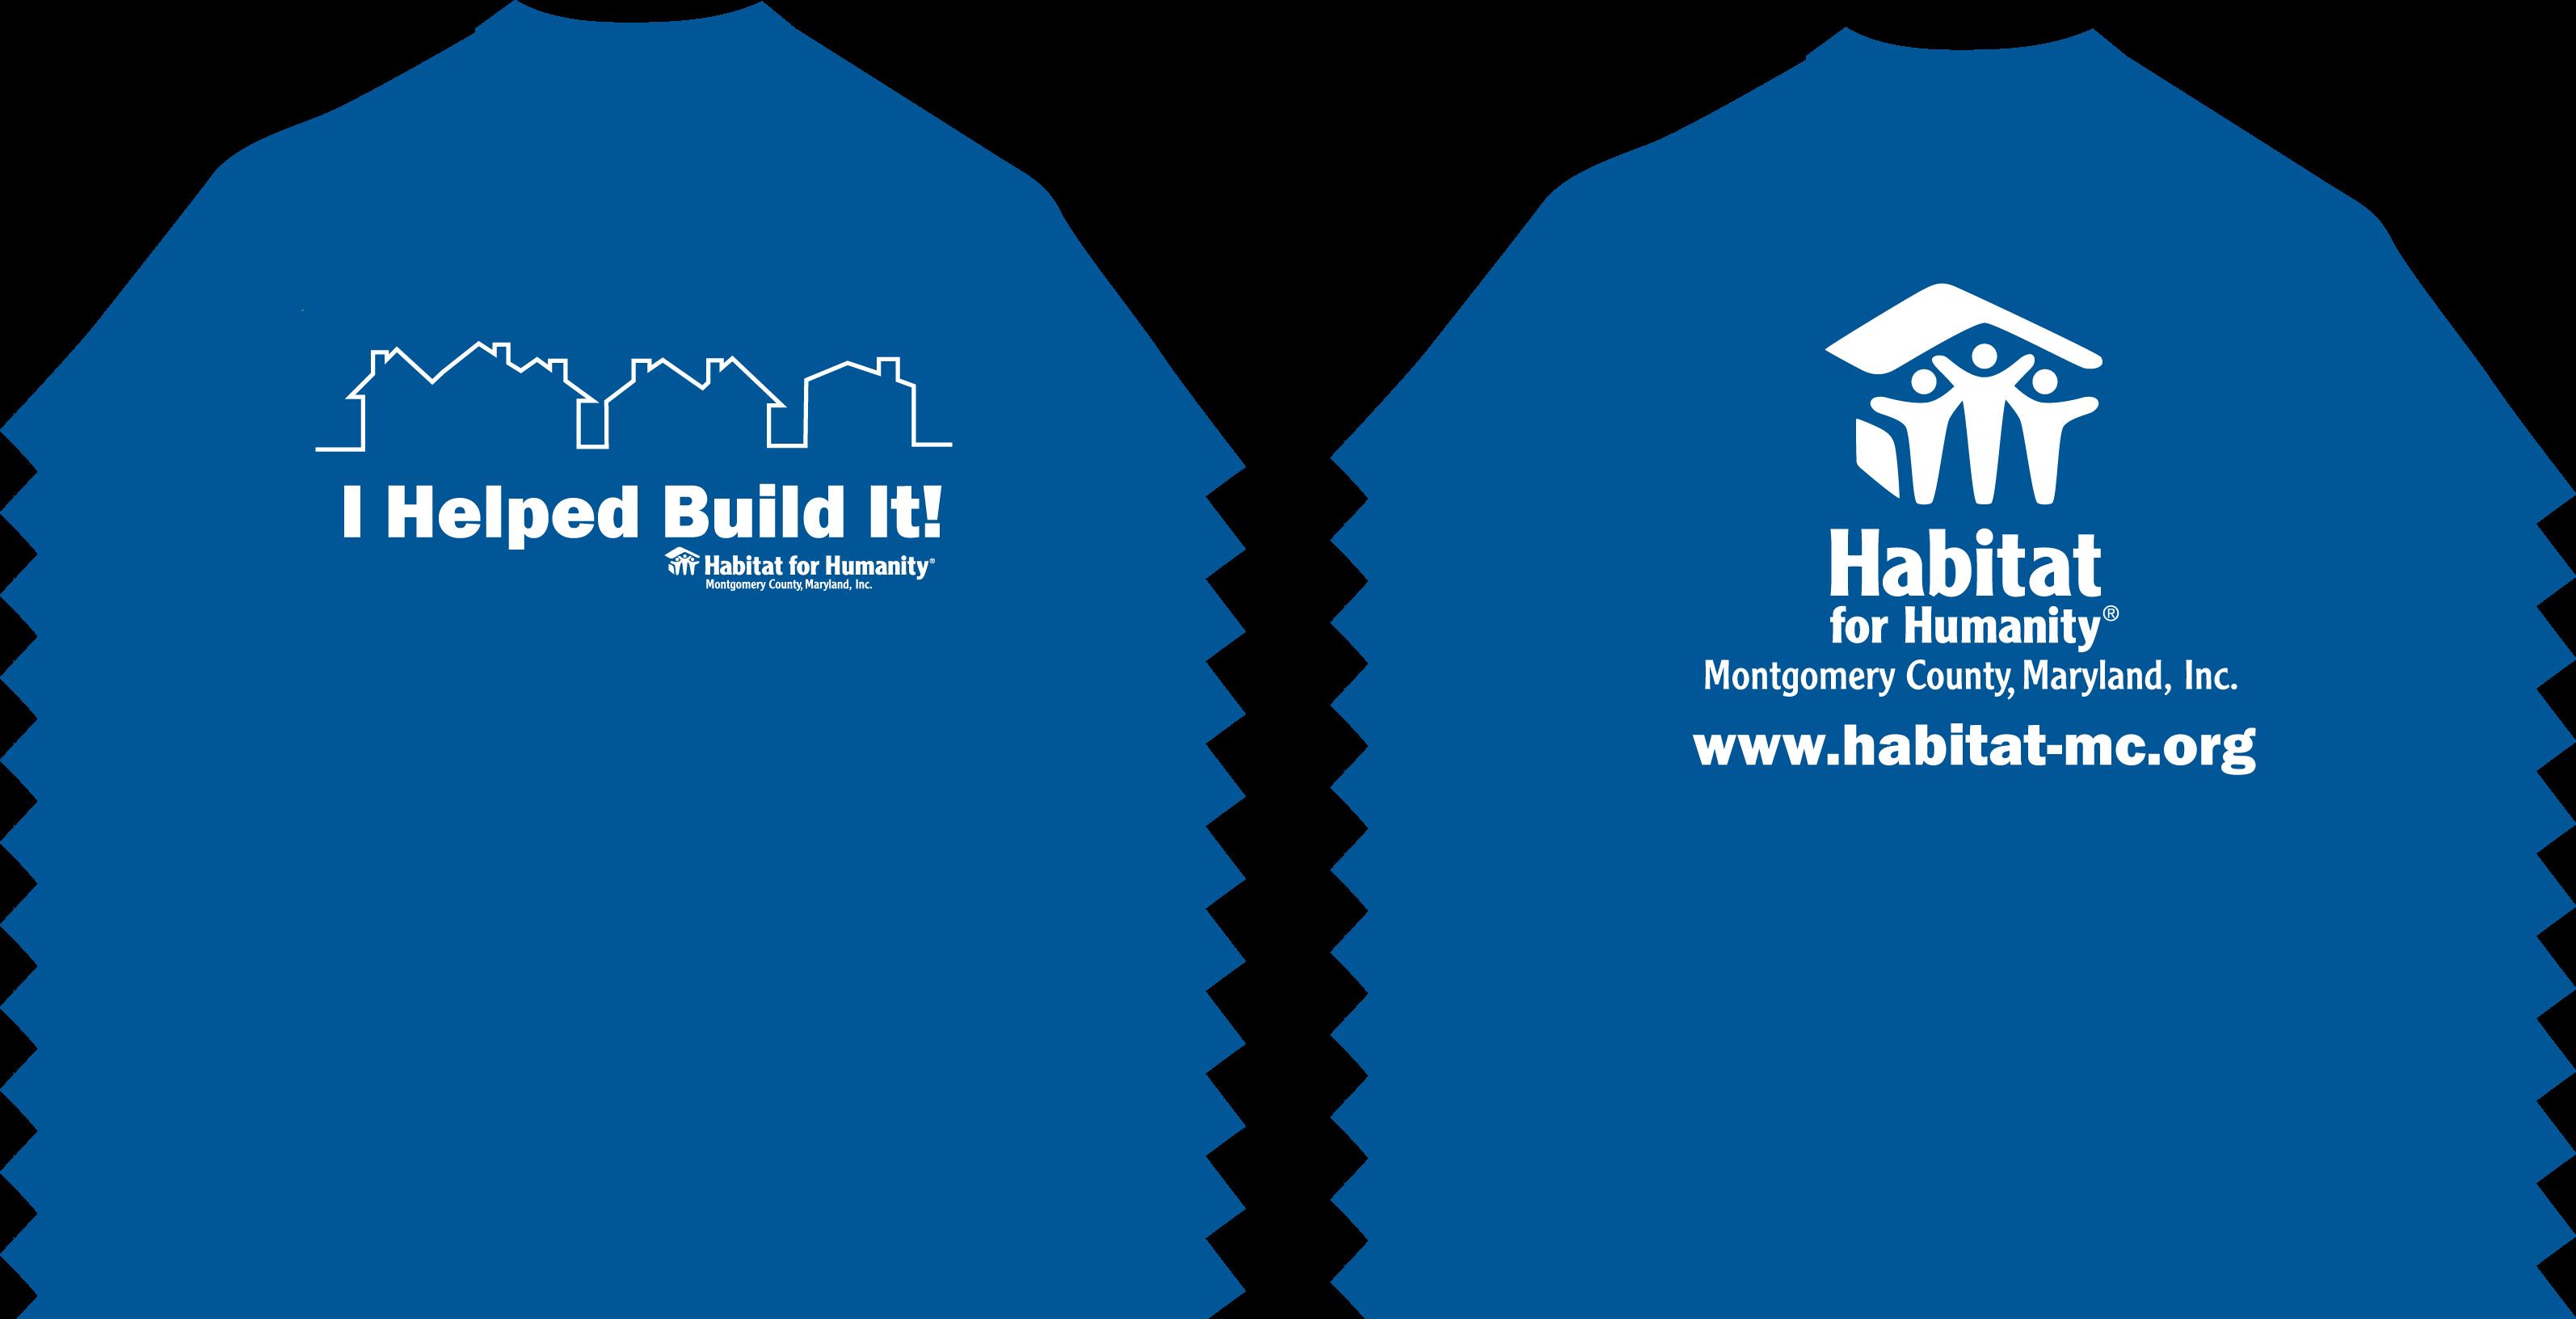 Design t shirt at home - Ideas Home Family Reunion T Shirts Family Reunion T Shirt Design Custom T Shirt Design Lexington Nursing Home 2 Give The Ball To